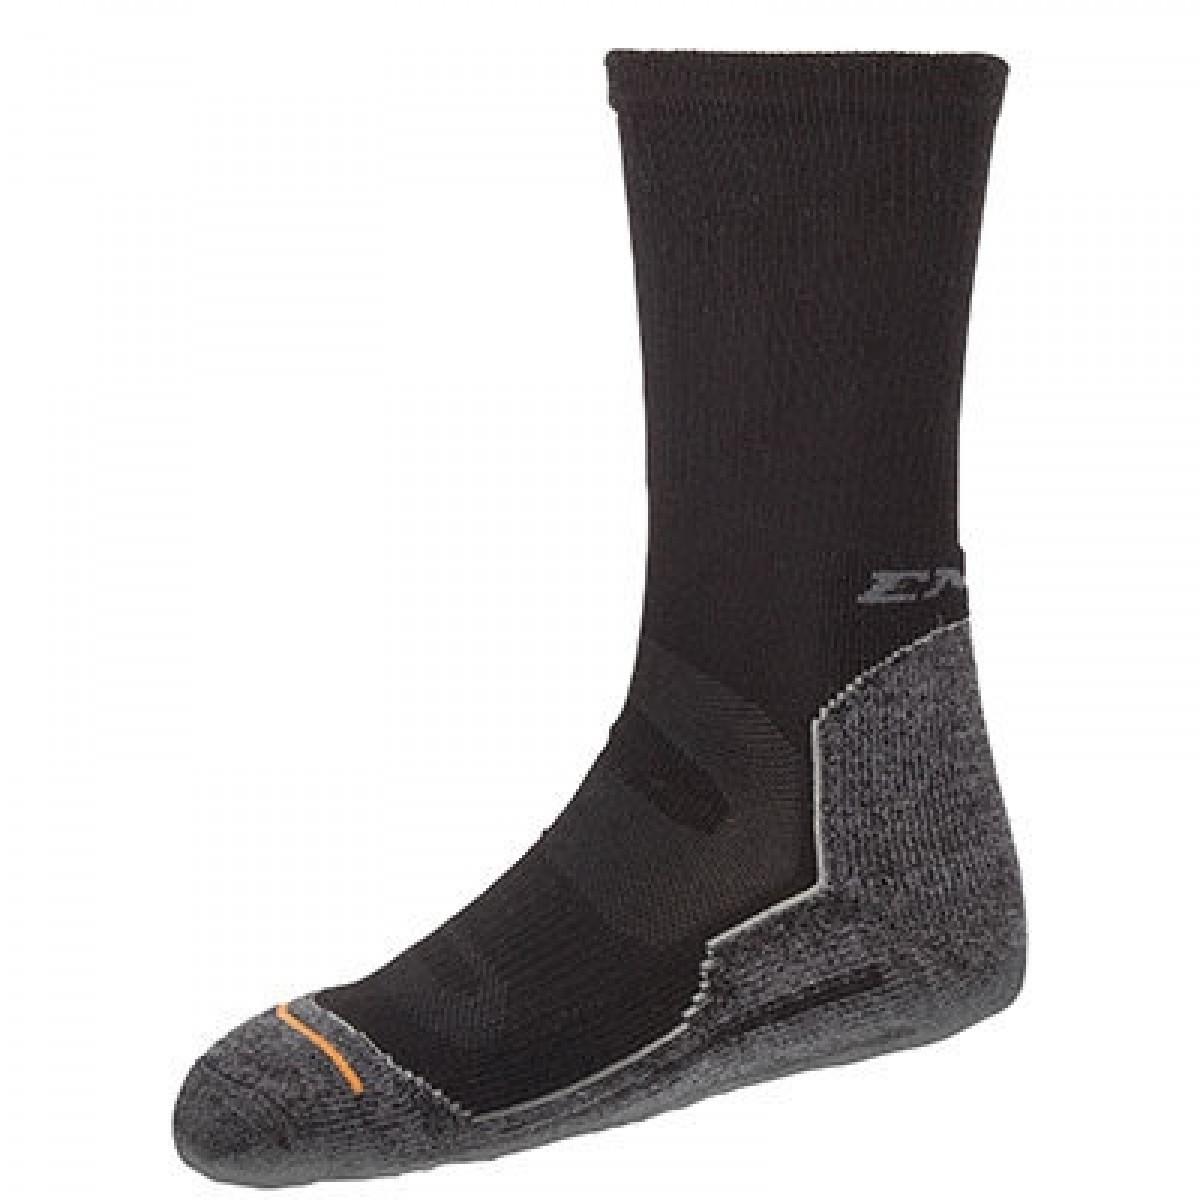 F. Engel Coolmax sokker-31